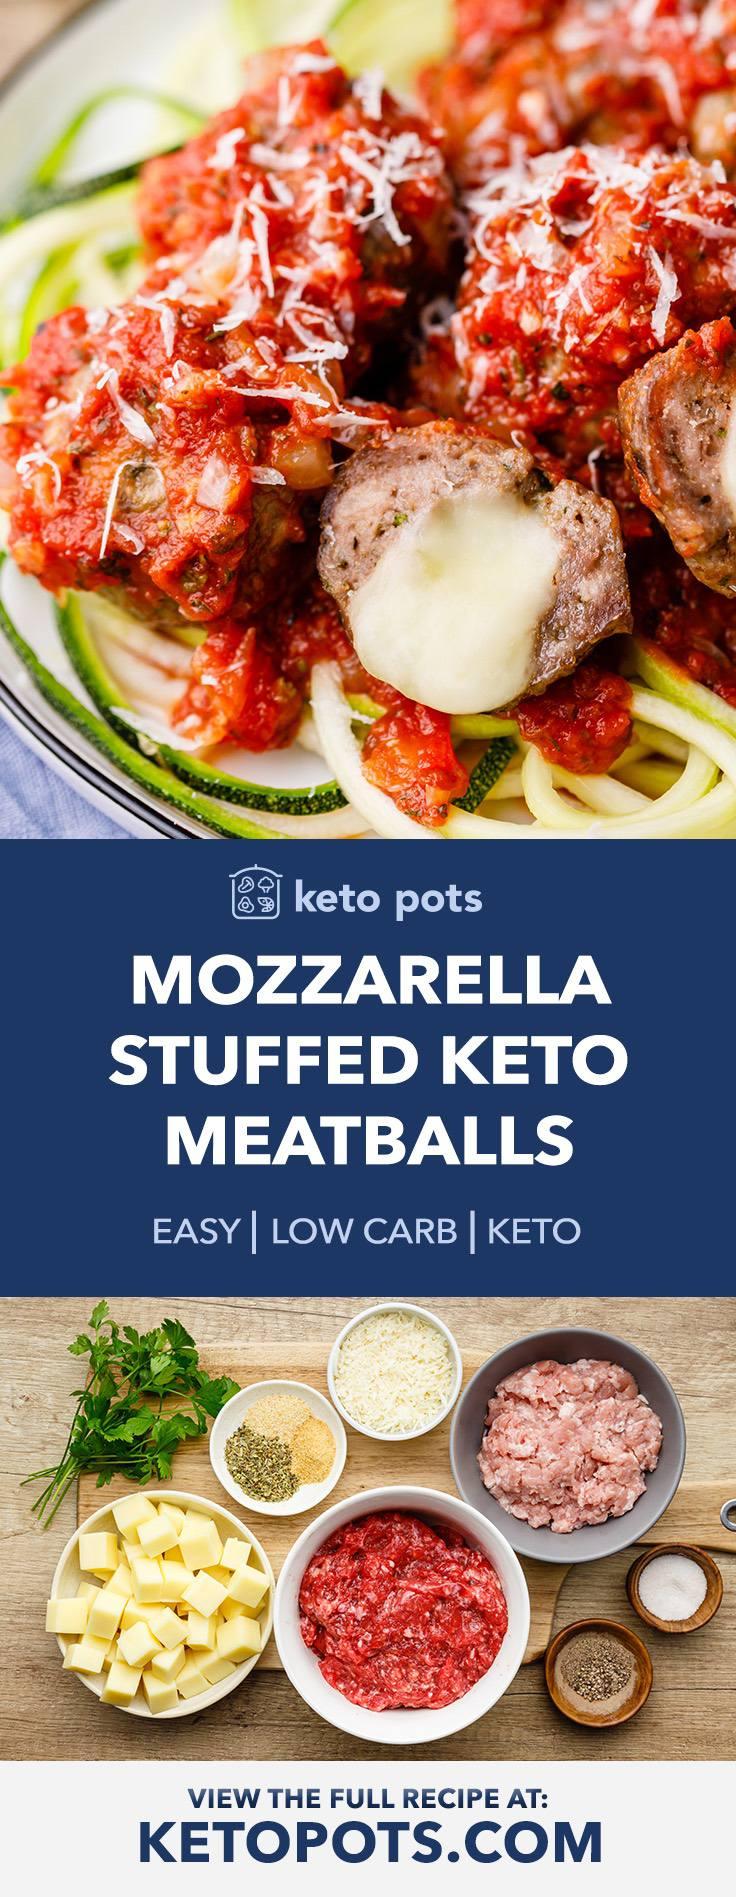 Mozzarella Stuffed Keto Meatballs with Homemade Marinara Sauce